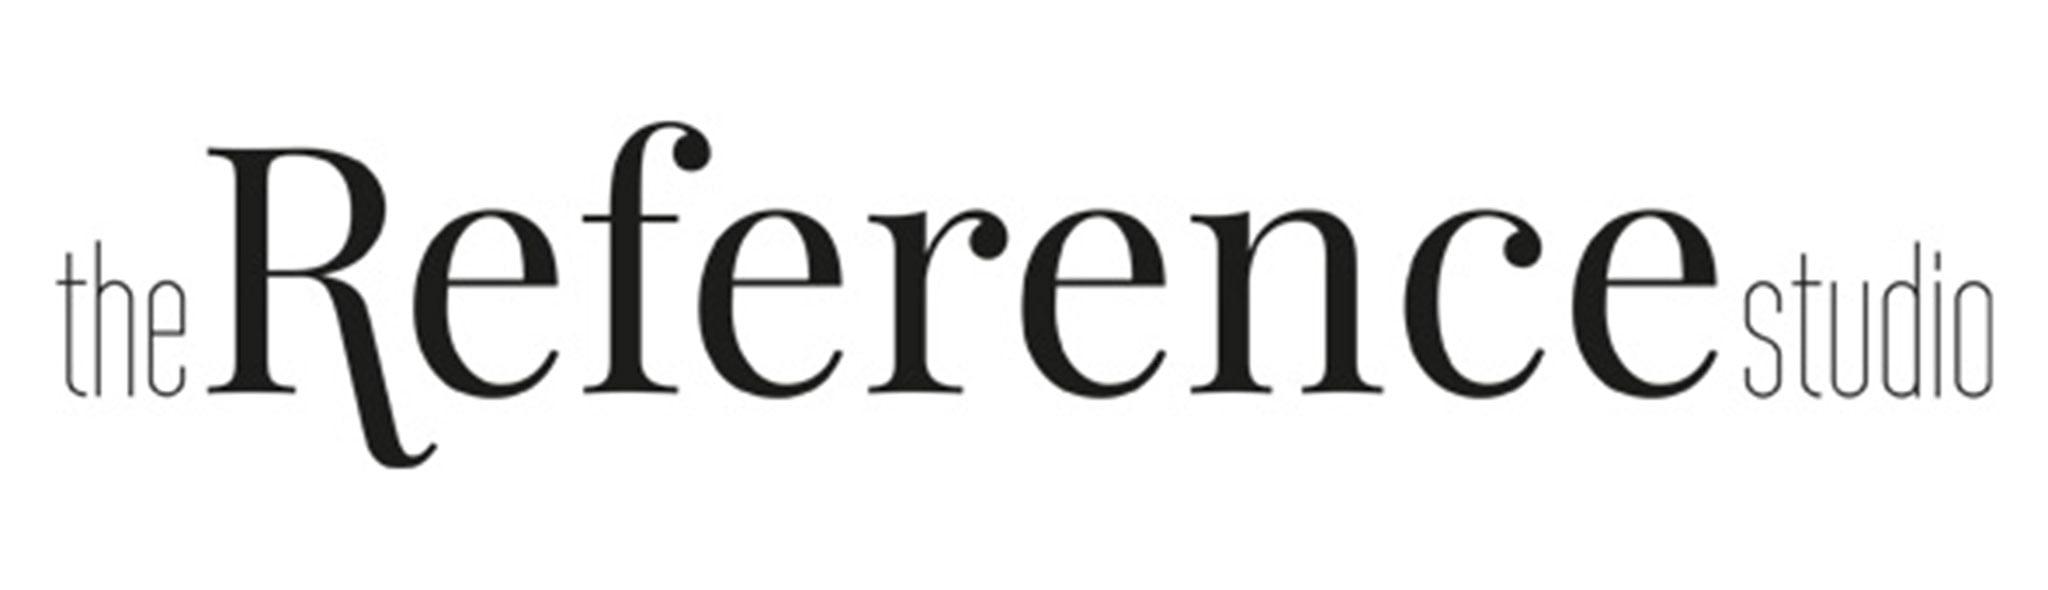 Logotipo The Reference Studio